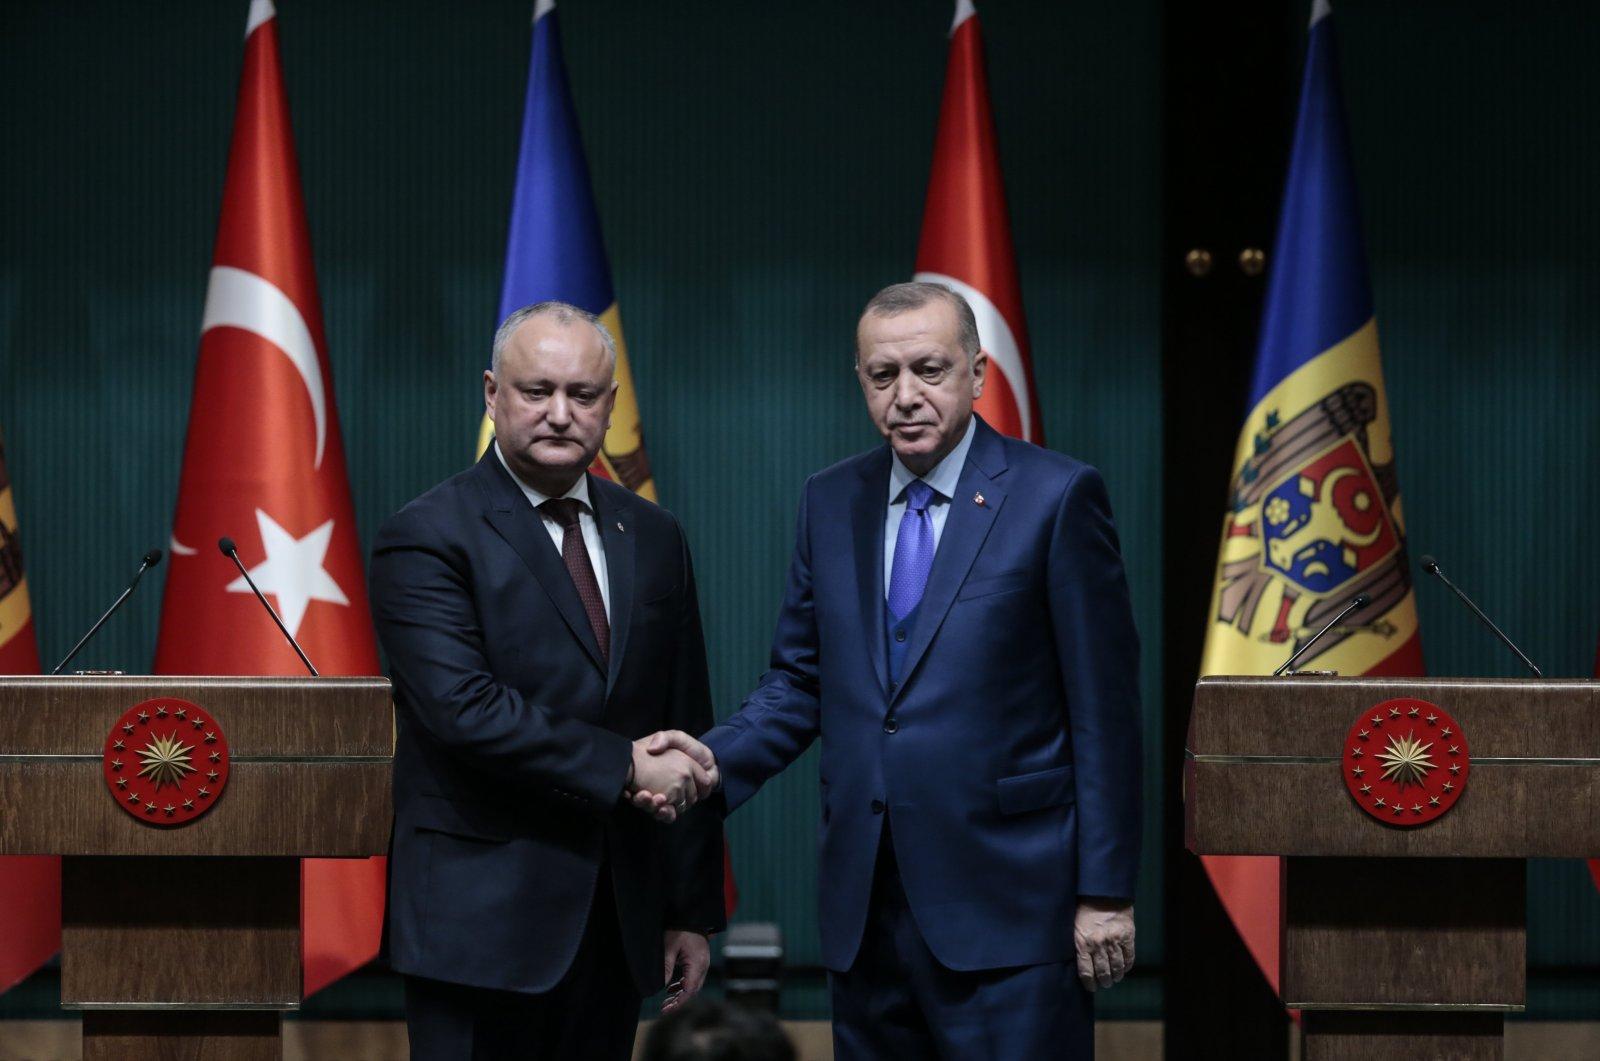 President Recep Tayyip Erdoğan (R) and Moldova's President Igor Dodon (L) during a joint press conference in Turkish capital Ankara, December 31, 2019. (AA Photo)